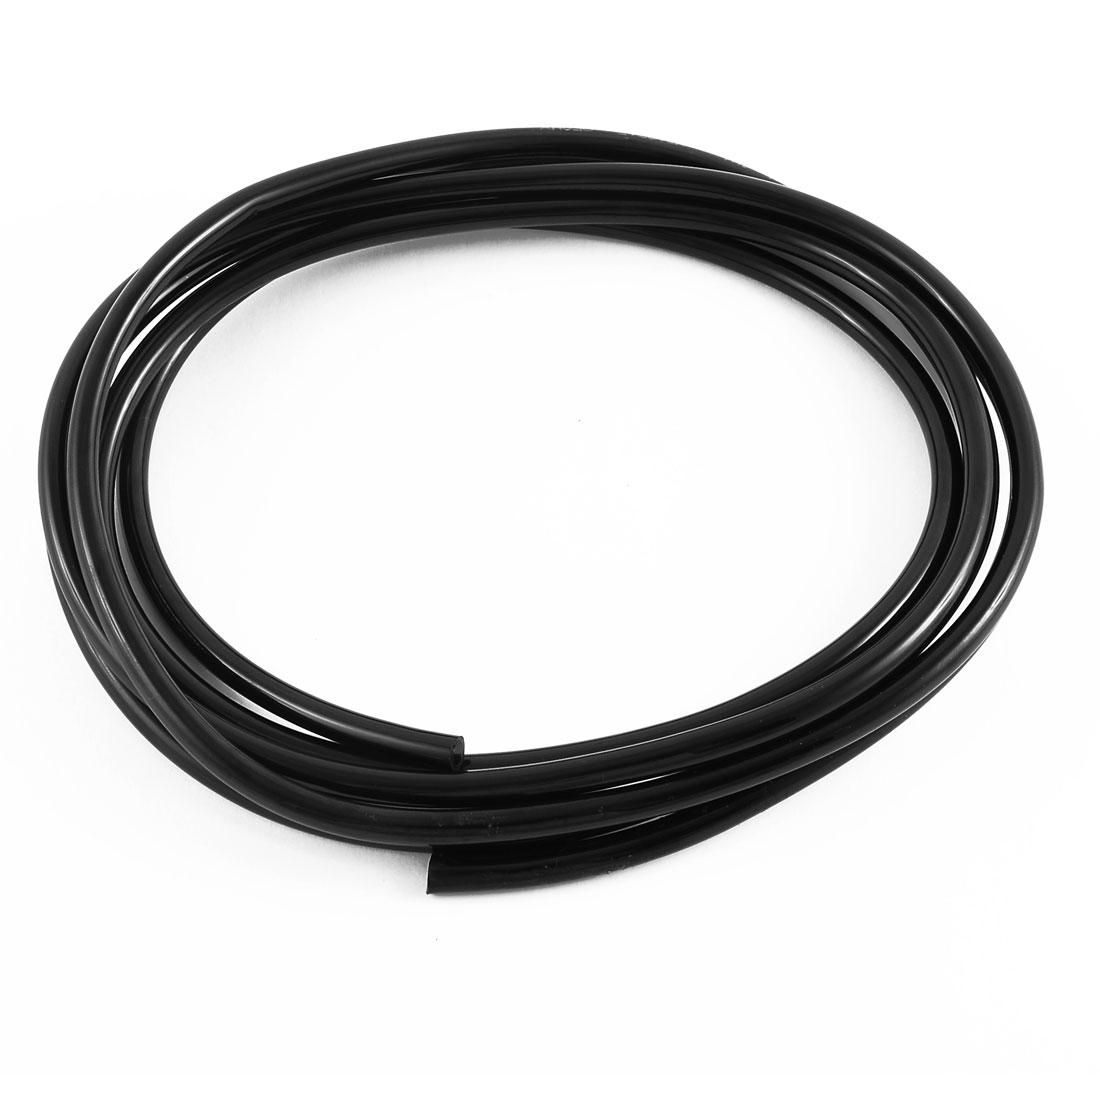 Industrial PU Flexible Pneumatic Tube Hose Pipe Black 2.3M Long